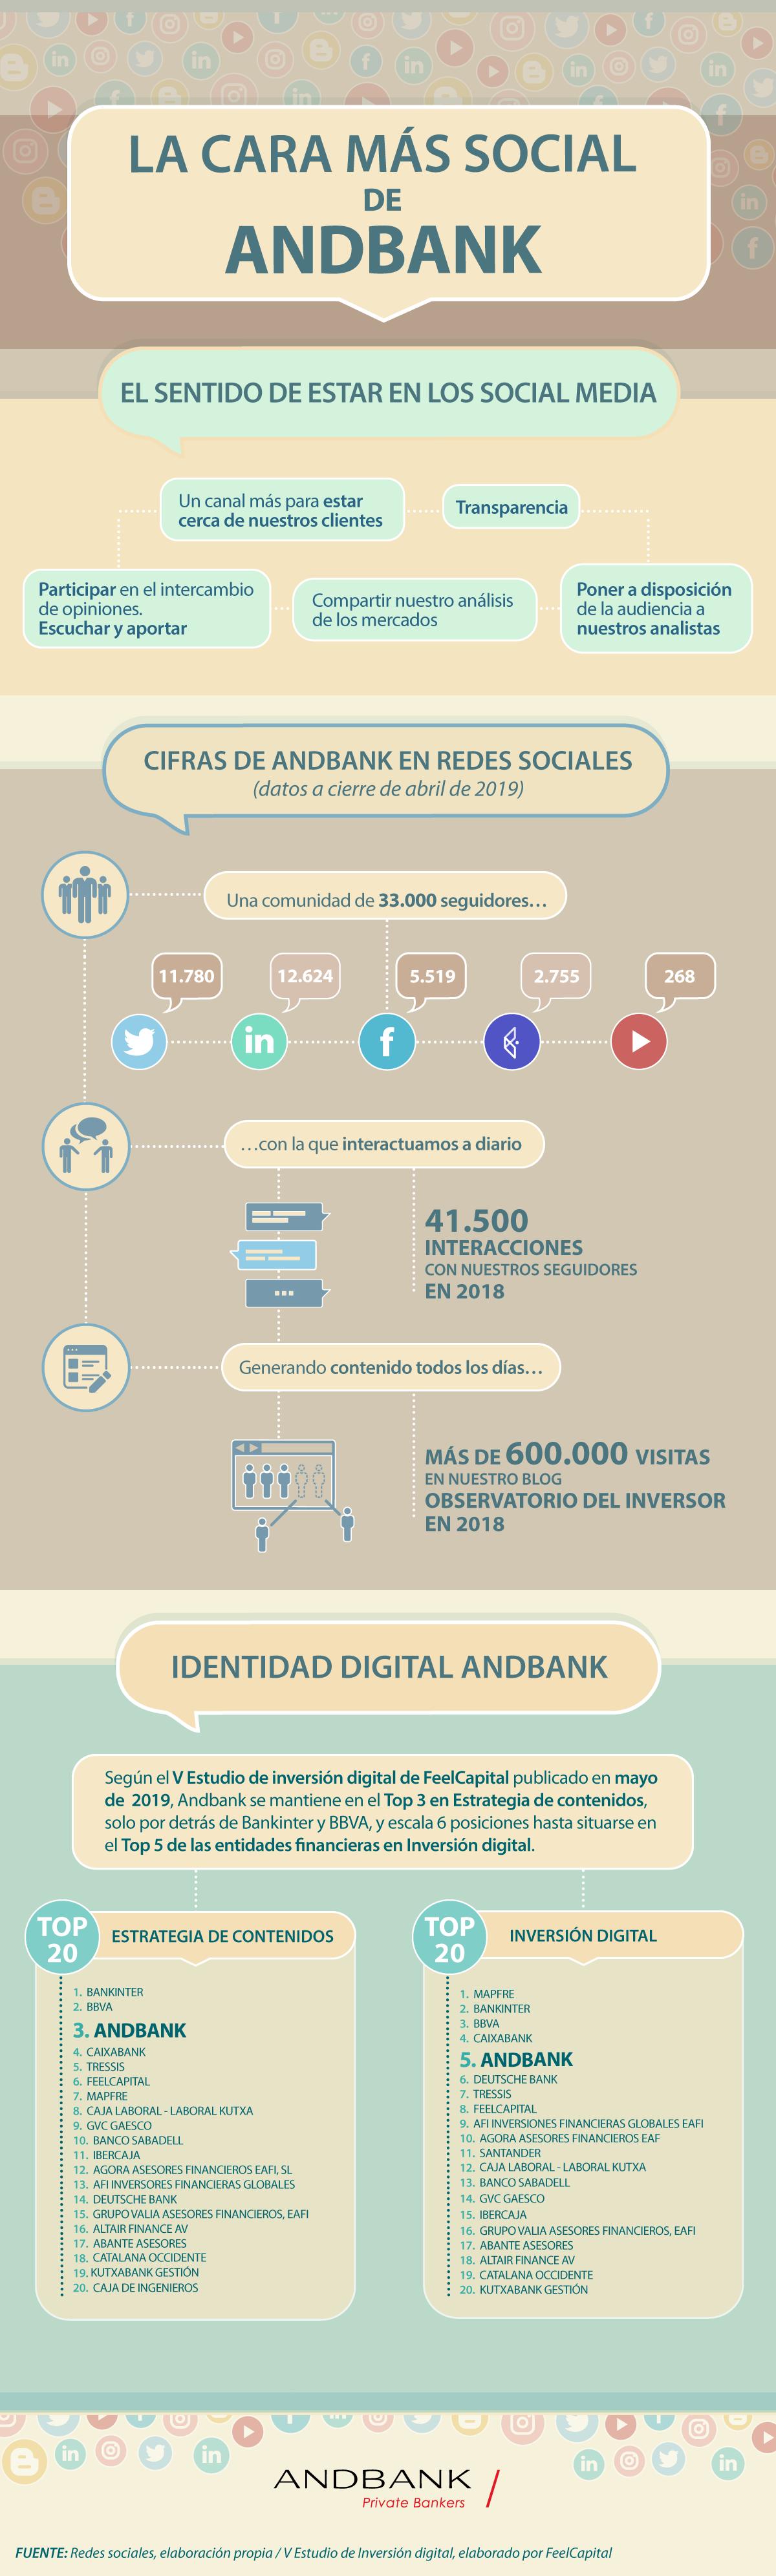 Infografia Andbank redes sociales